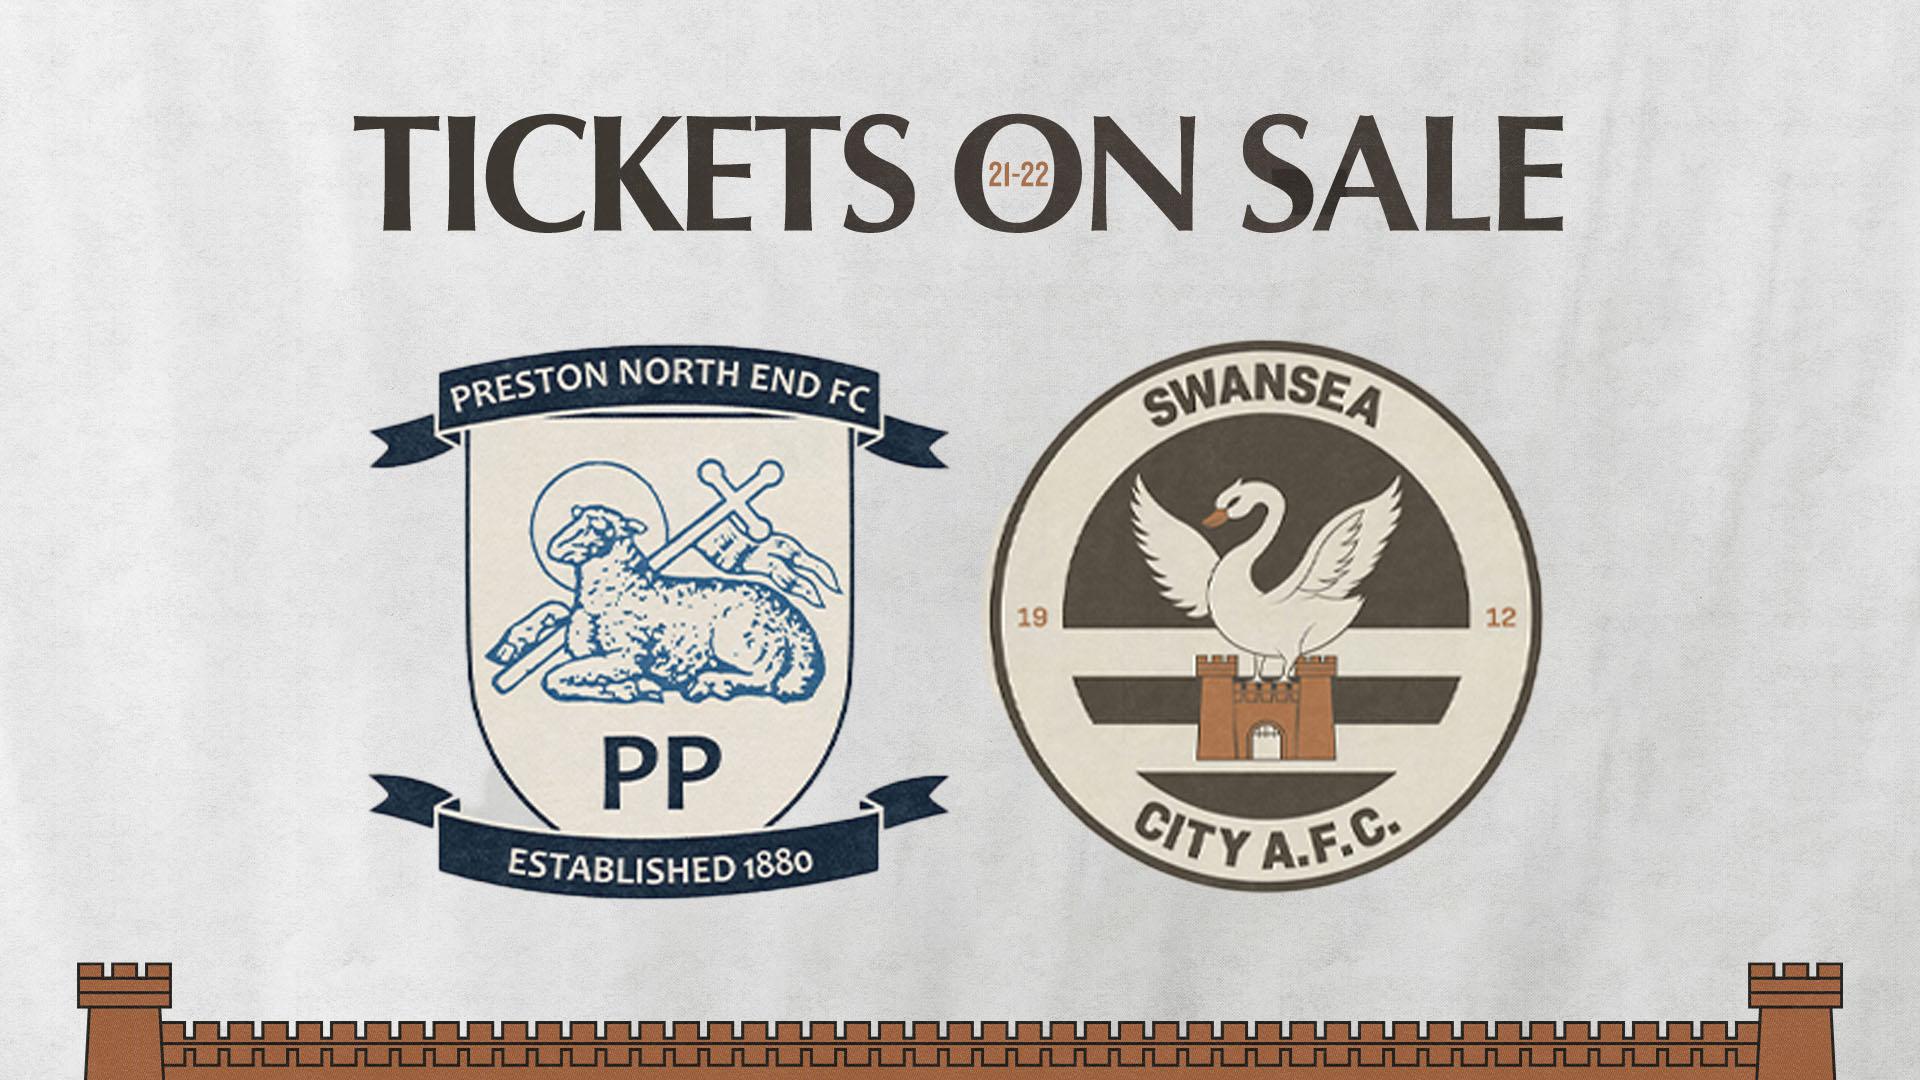 Preston away tickets